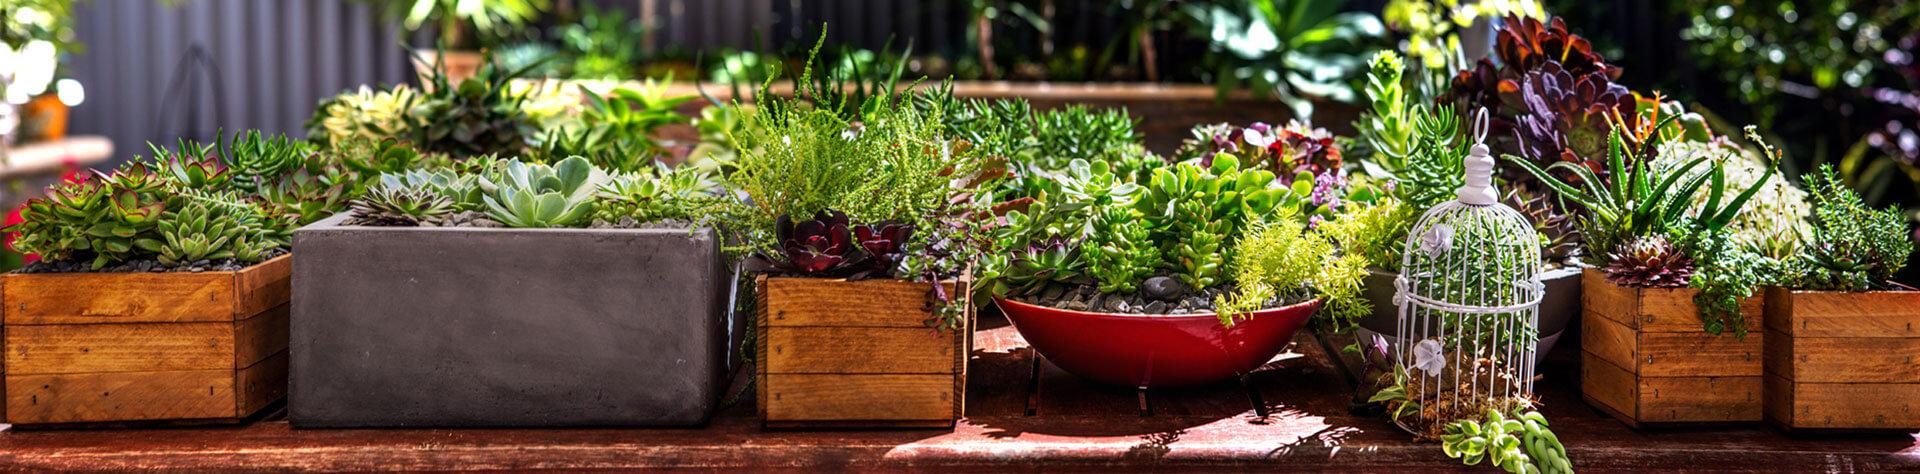 DIY Dipped Terra Cotta Succulent Favours